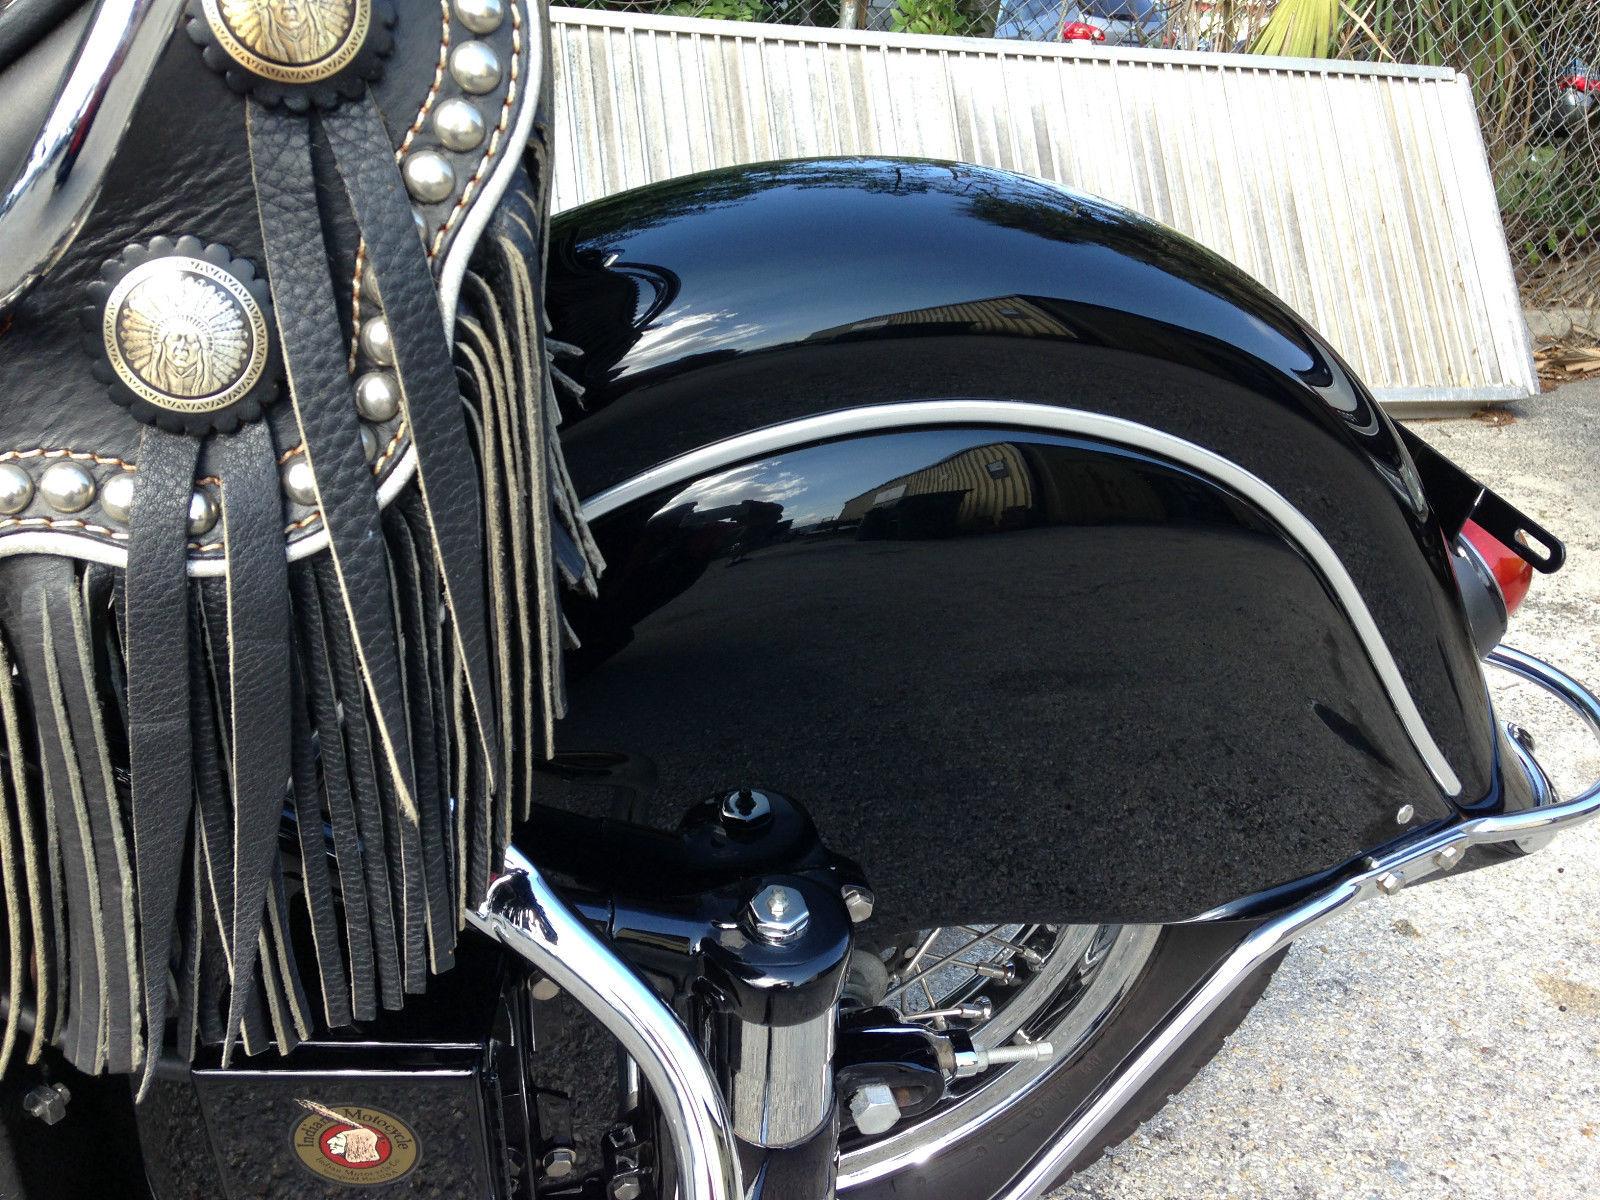 Indian Chief - 1947 - Rear Mudguard, Rear Shock and Rear Wheel.